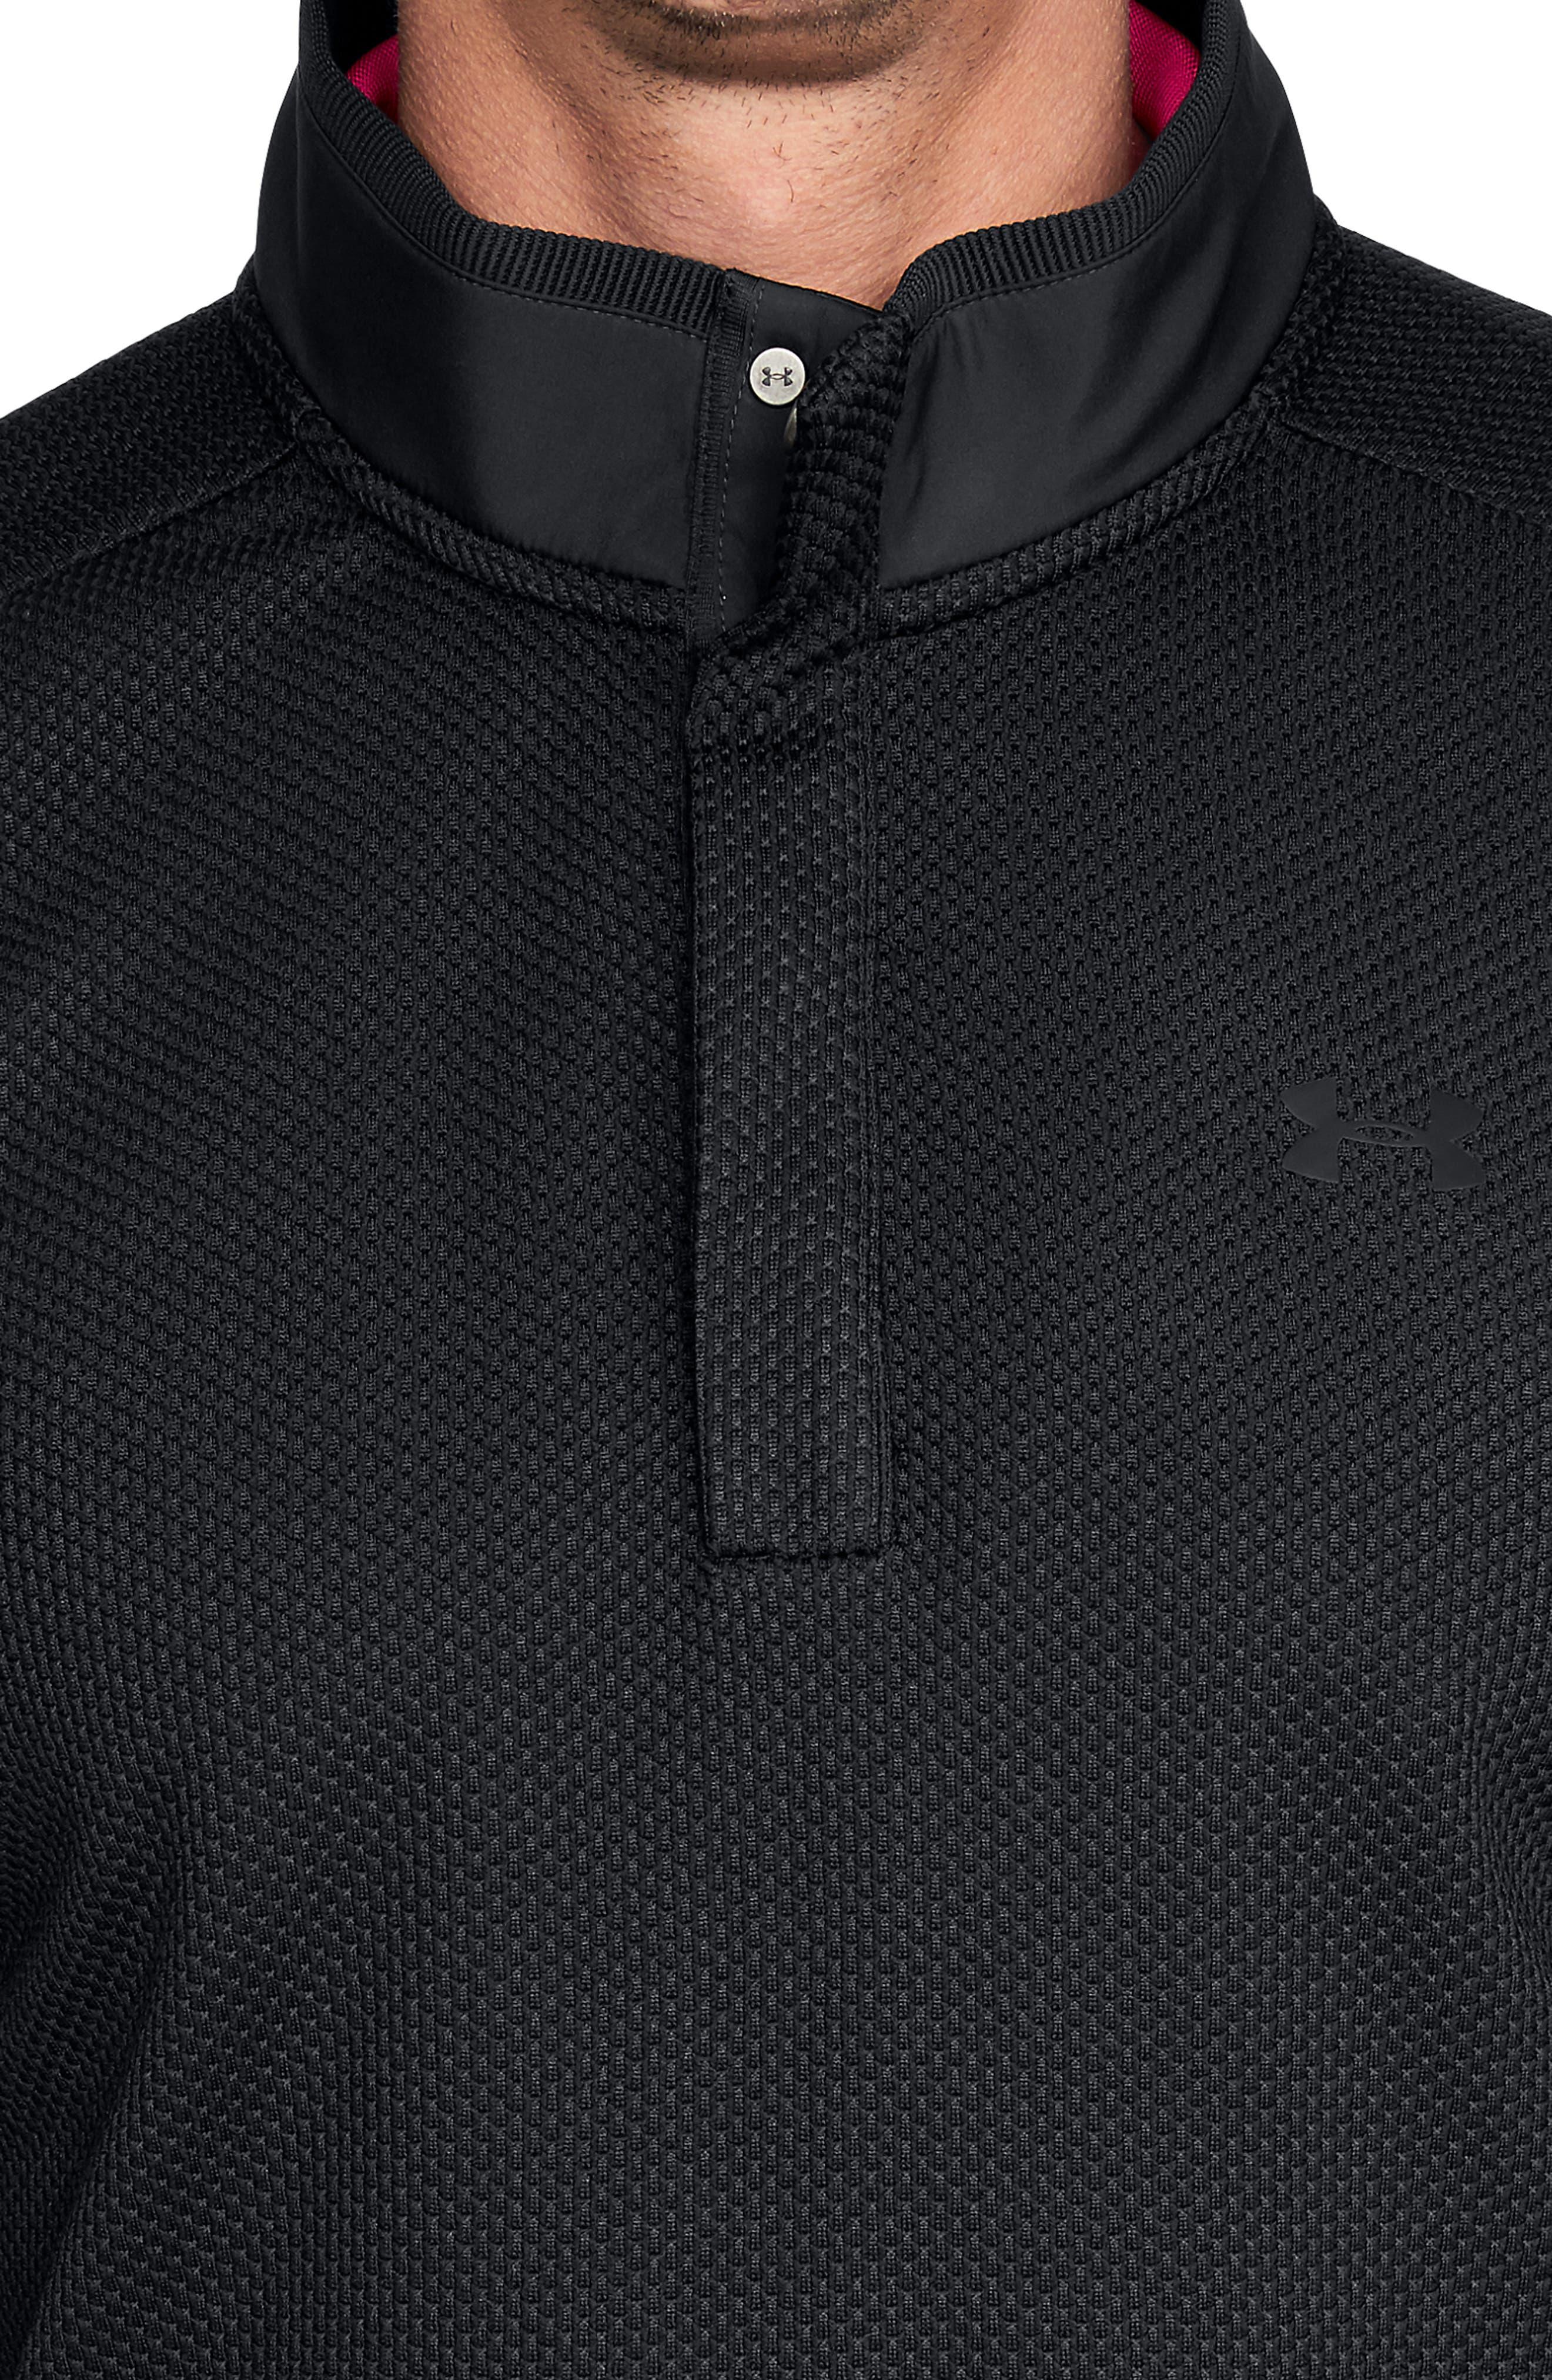 UNDER ARMOUR, Storm SweaterFleece Snap Mock Neck Pullover, Alternate thumbnail 3, color, BLACK/ BLACK/ BLACK